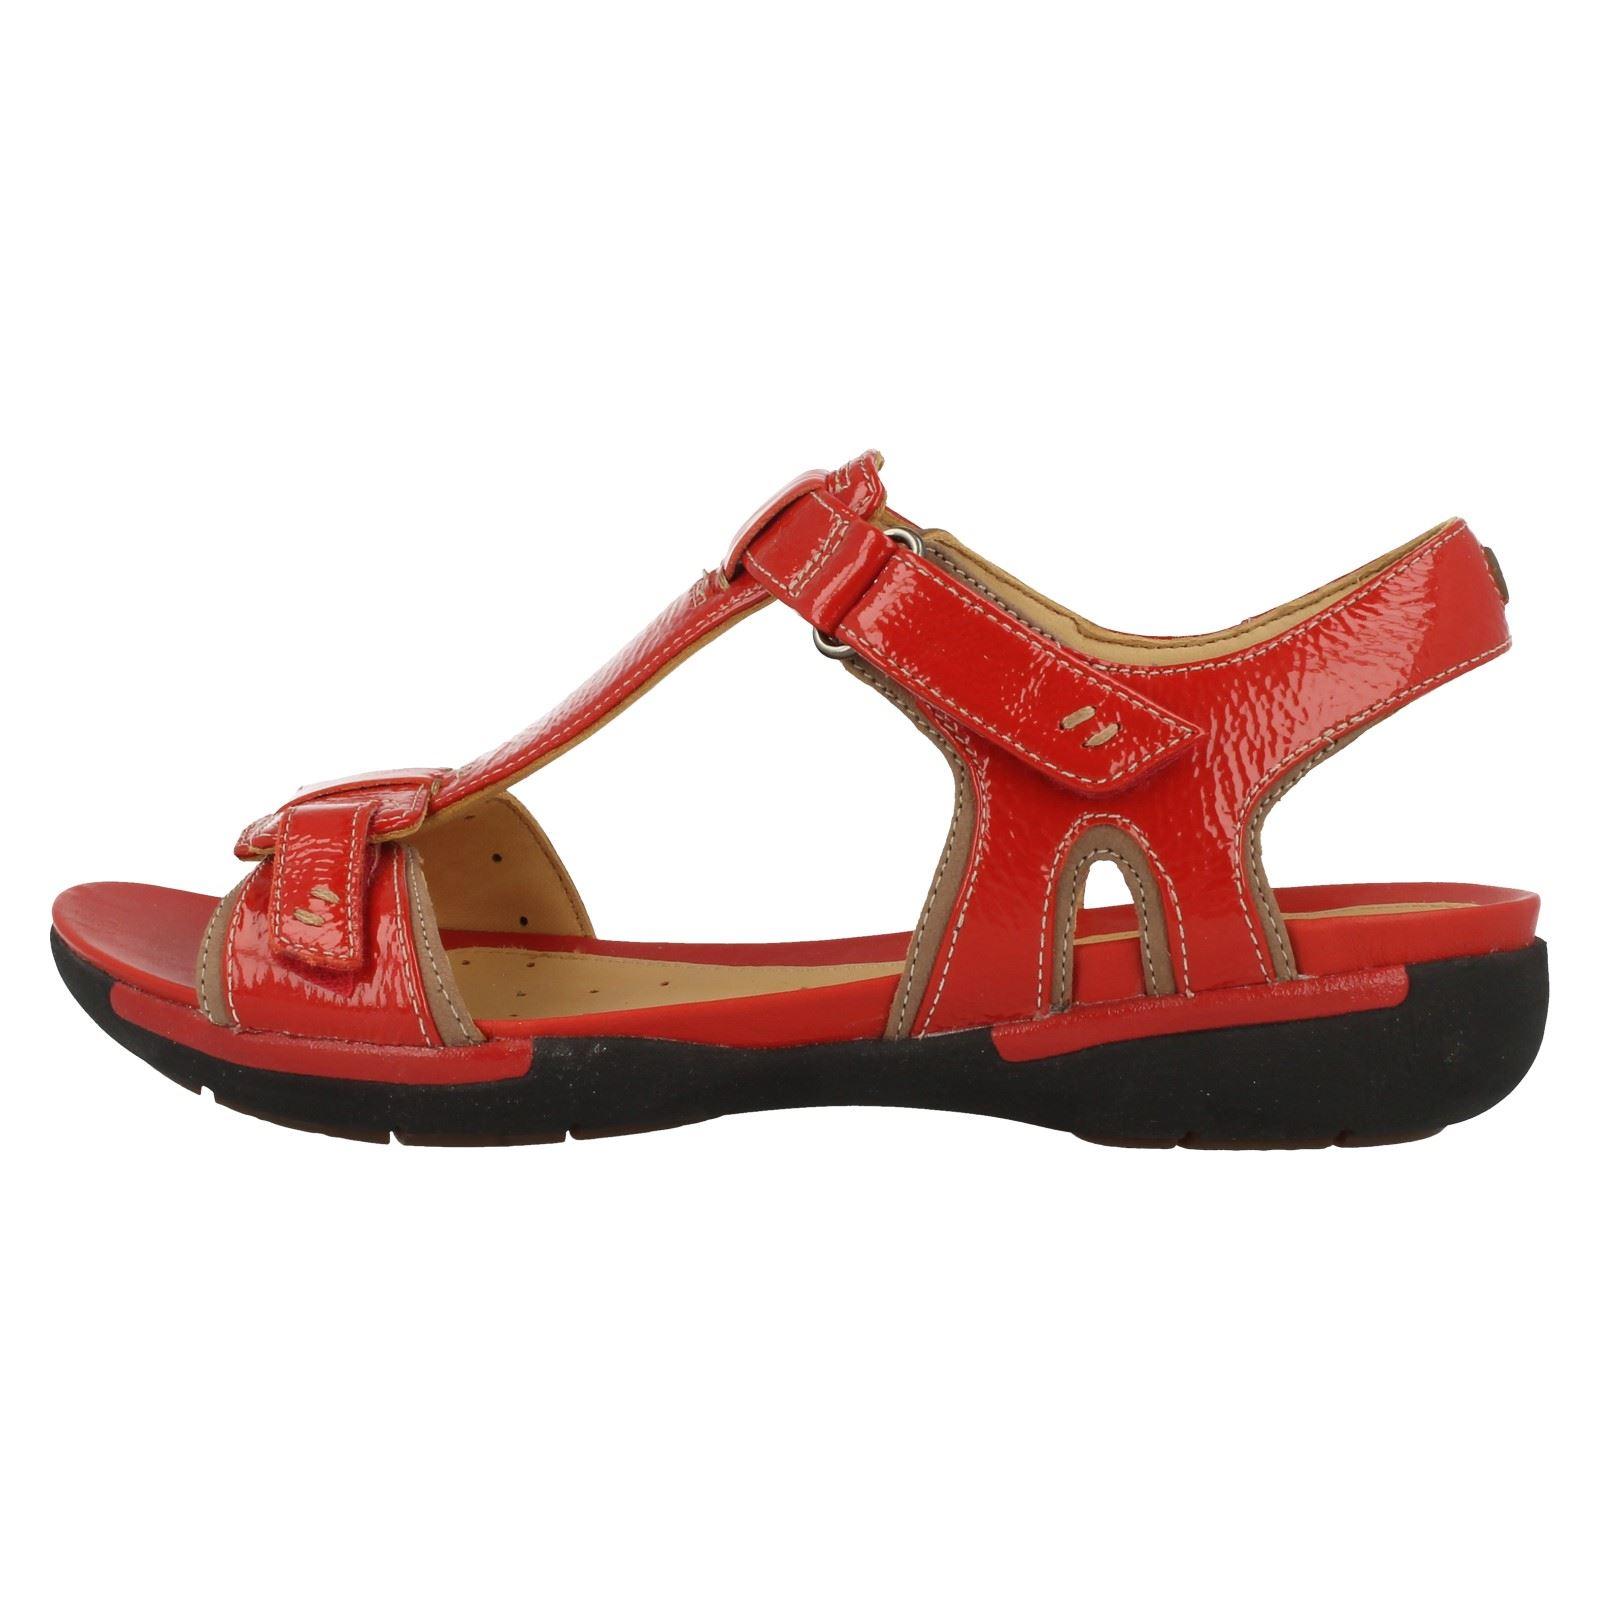 59b3f465061 Ladies-Unstructured-Clarks-Sandals-Un-Voshell thumbnail 22